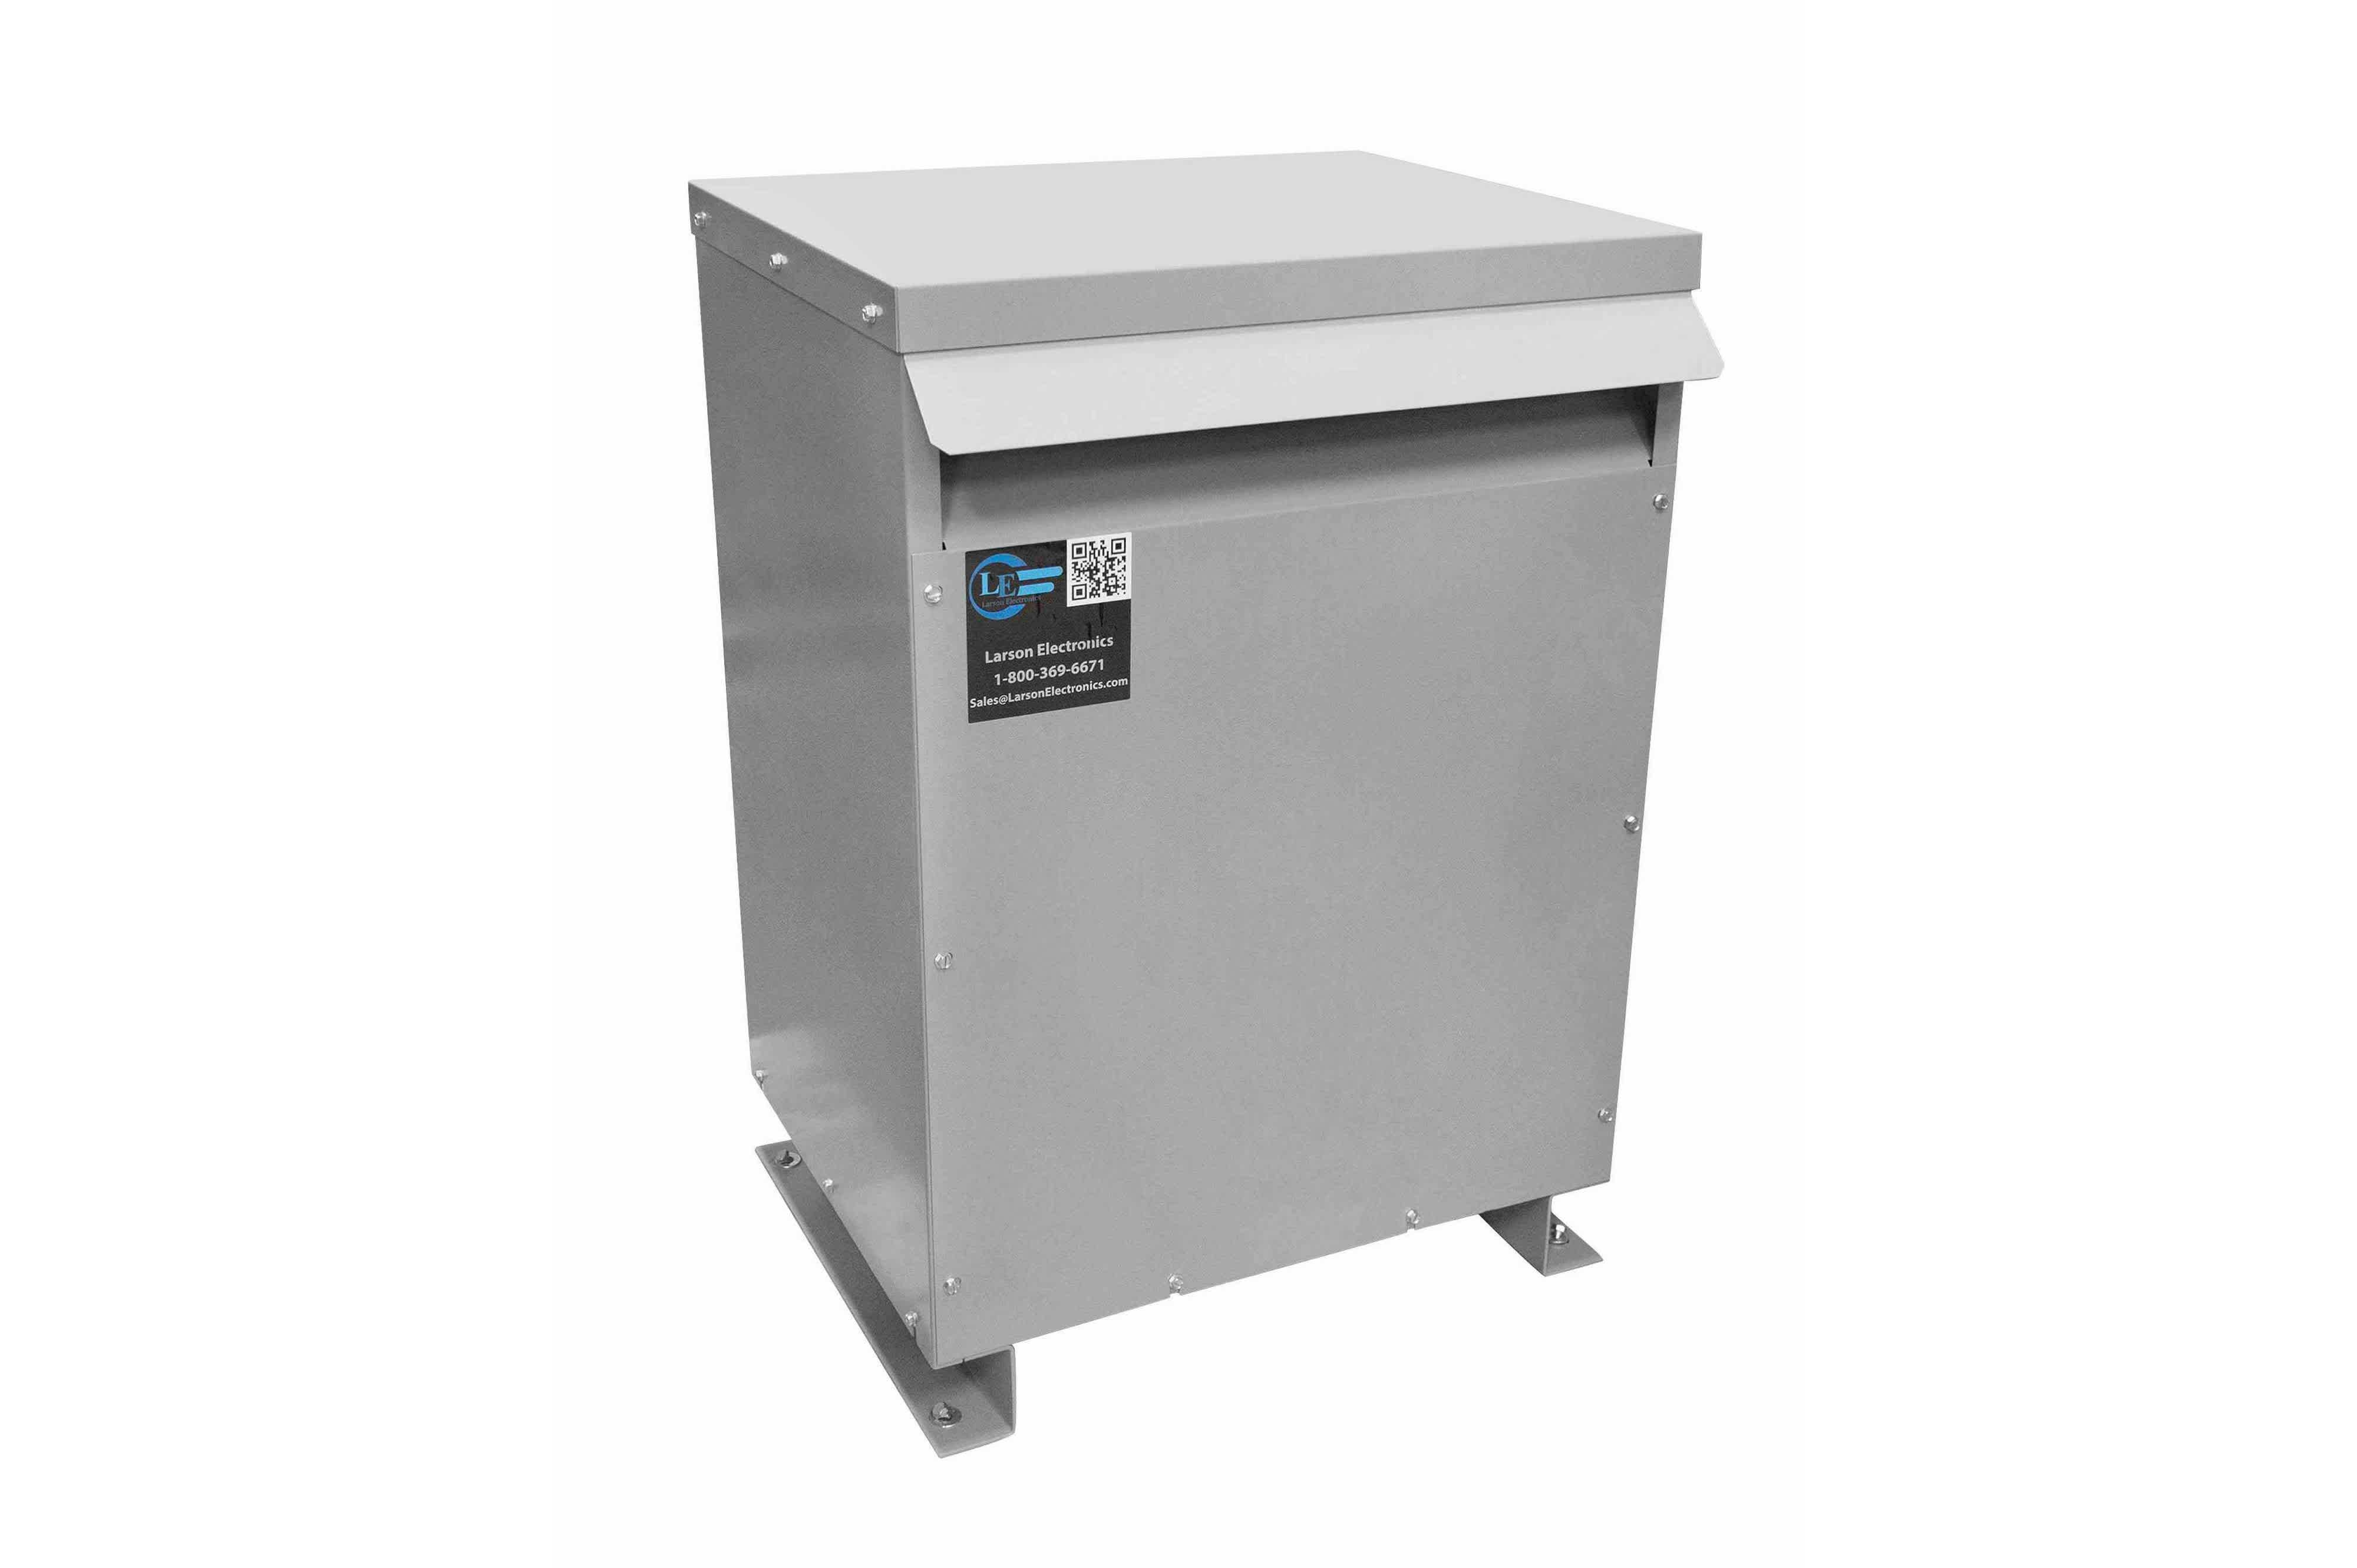 225 kVA 3PH Isolation Transformer, 480V Wye Primary, 480Y/277 Wye-N Secondary, N3R, Ventilated, 60 Hz